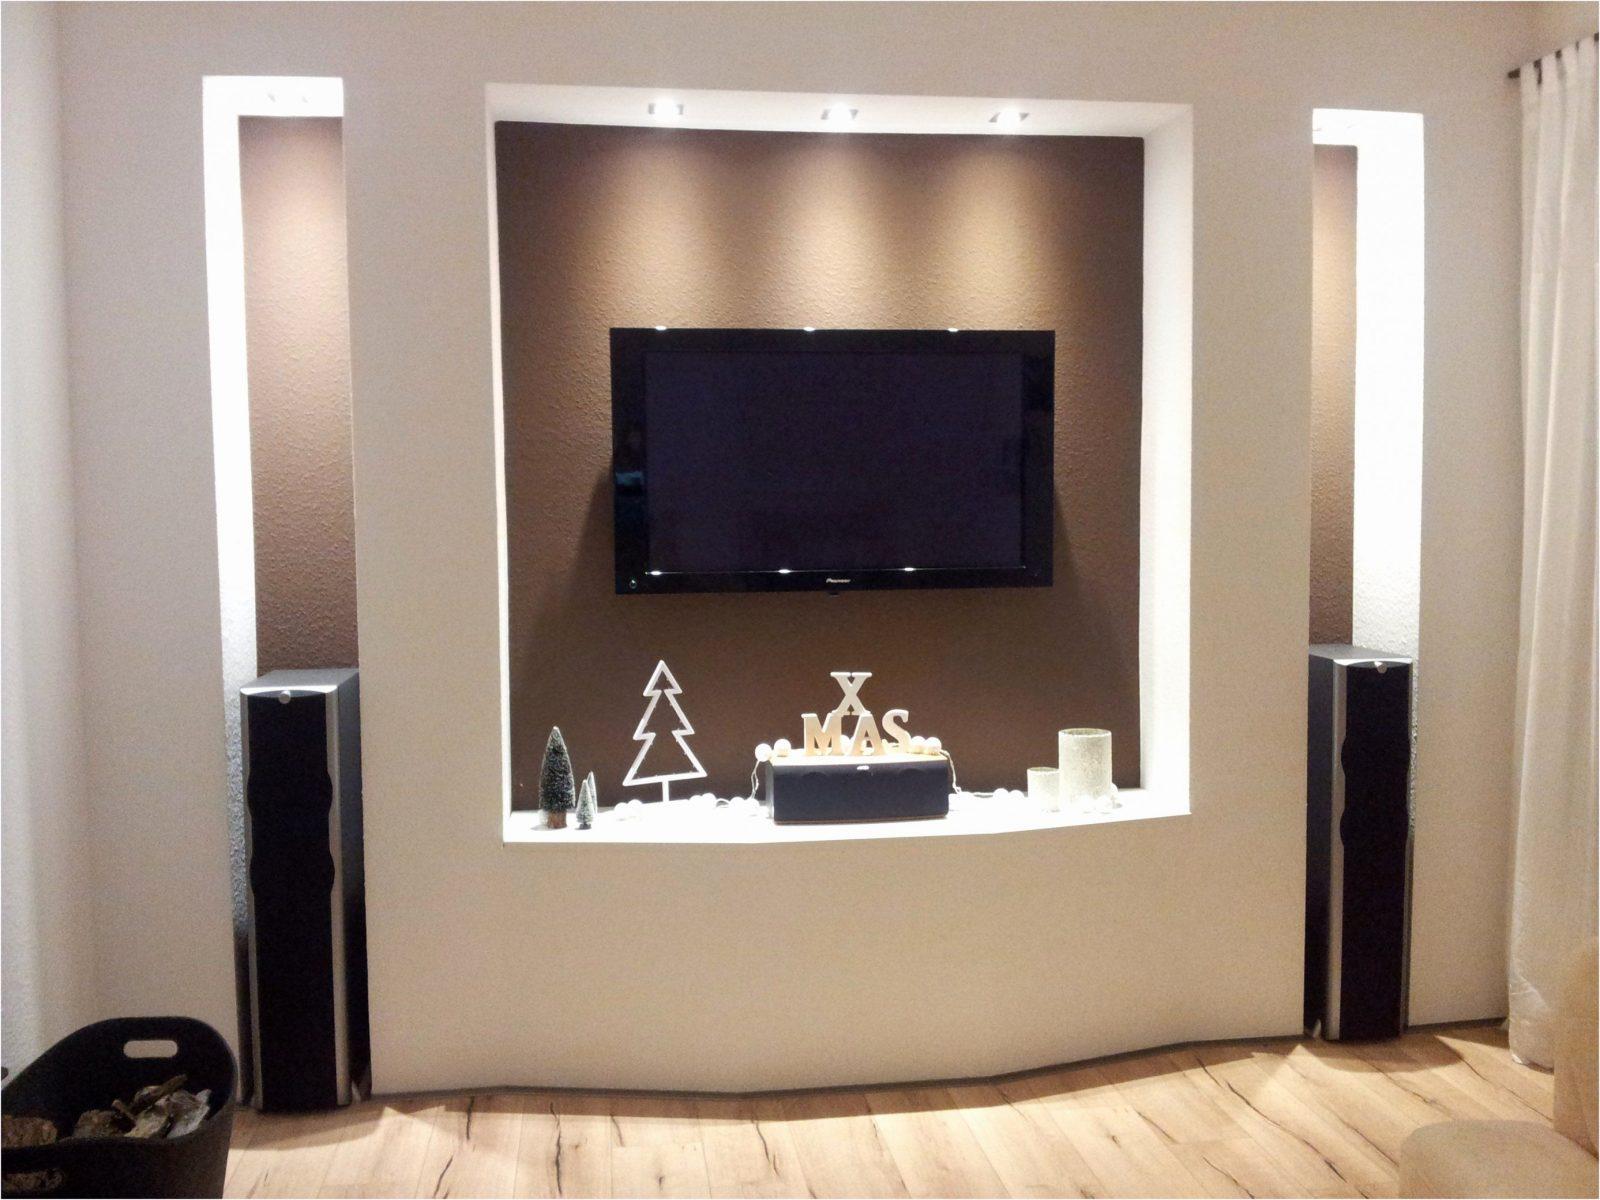 tv m bel selber bauen luxus tv bank selbst bauen gallery excellent von tv bank selbst bauen. Black Bedroom Furniture Sets. Home Design Ideas